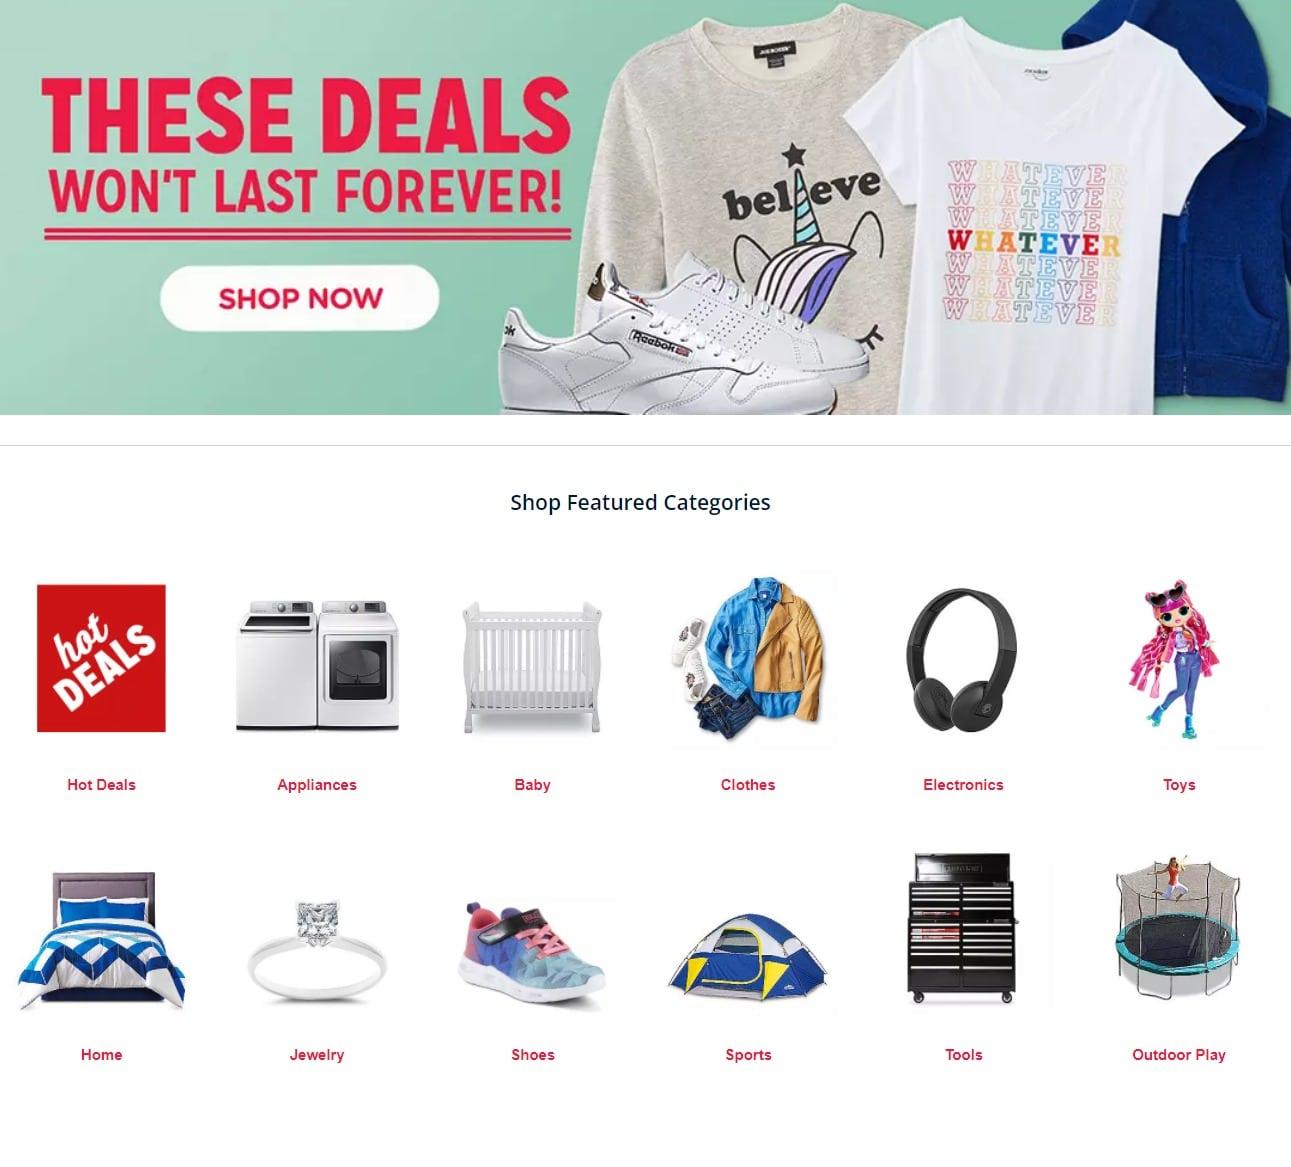 H Mart Weekly Ads & Sales November 20 - November 26, 2020